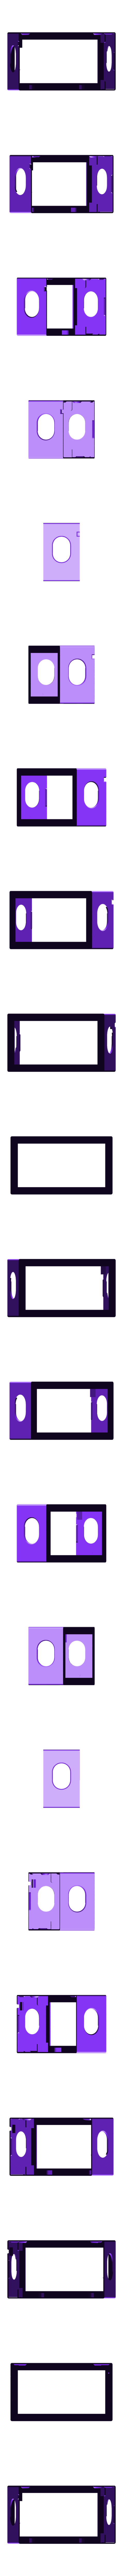 boomypi-frame.stl Download free STL file Raspberry Pi Airplay BoomBox • 3D printer template, Adafruit